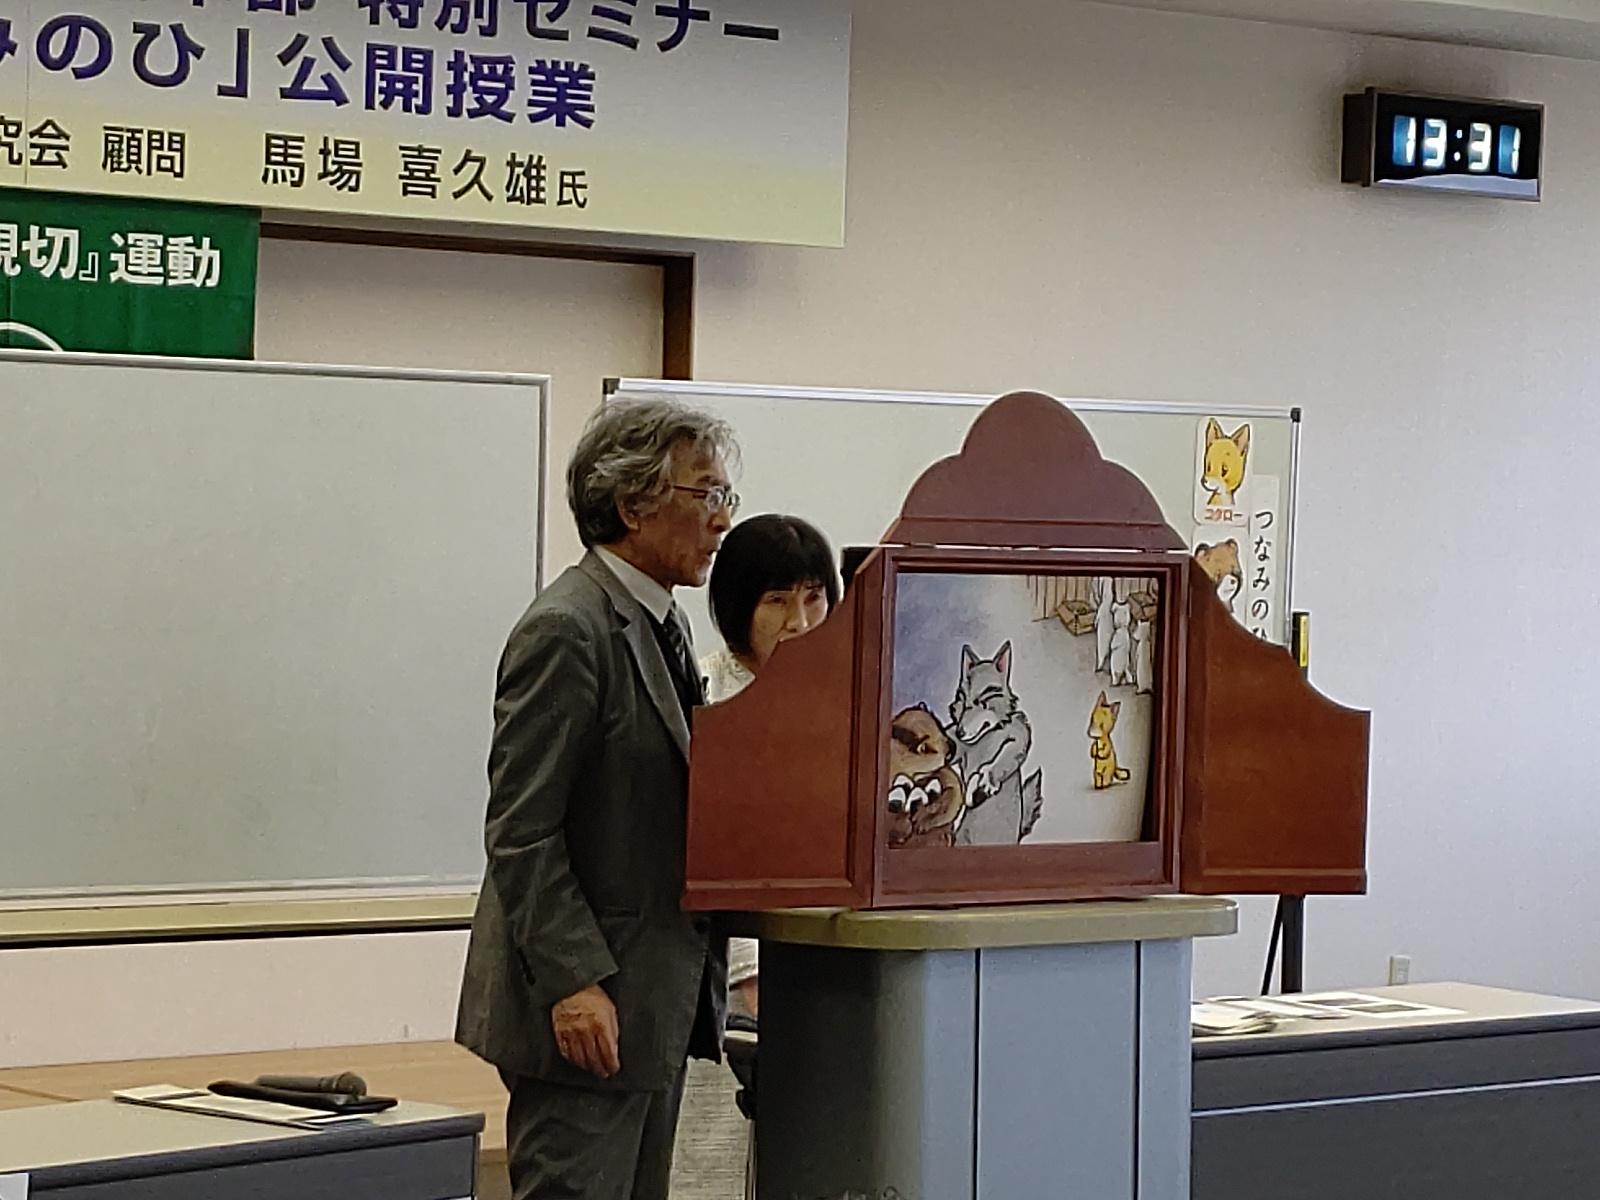 福井県で公開紙芝居授業を実施!